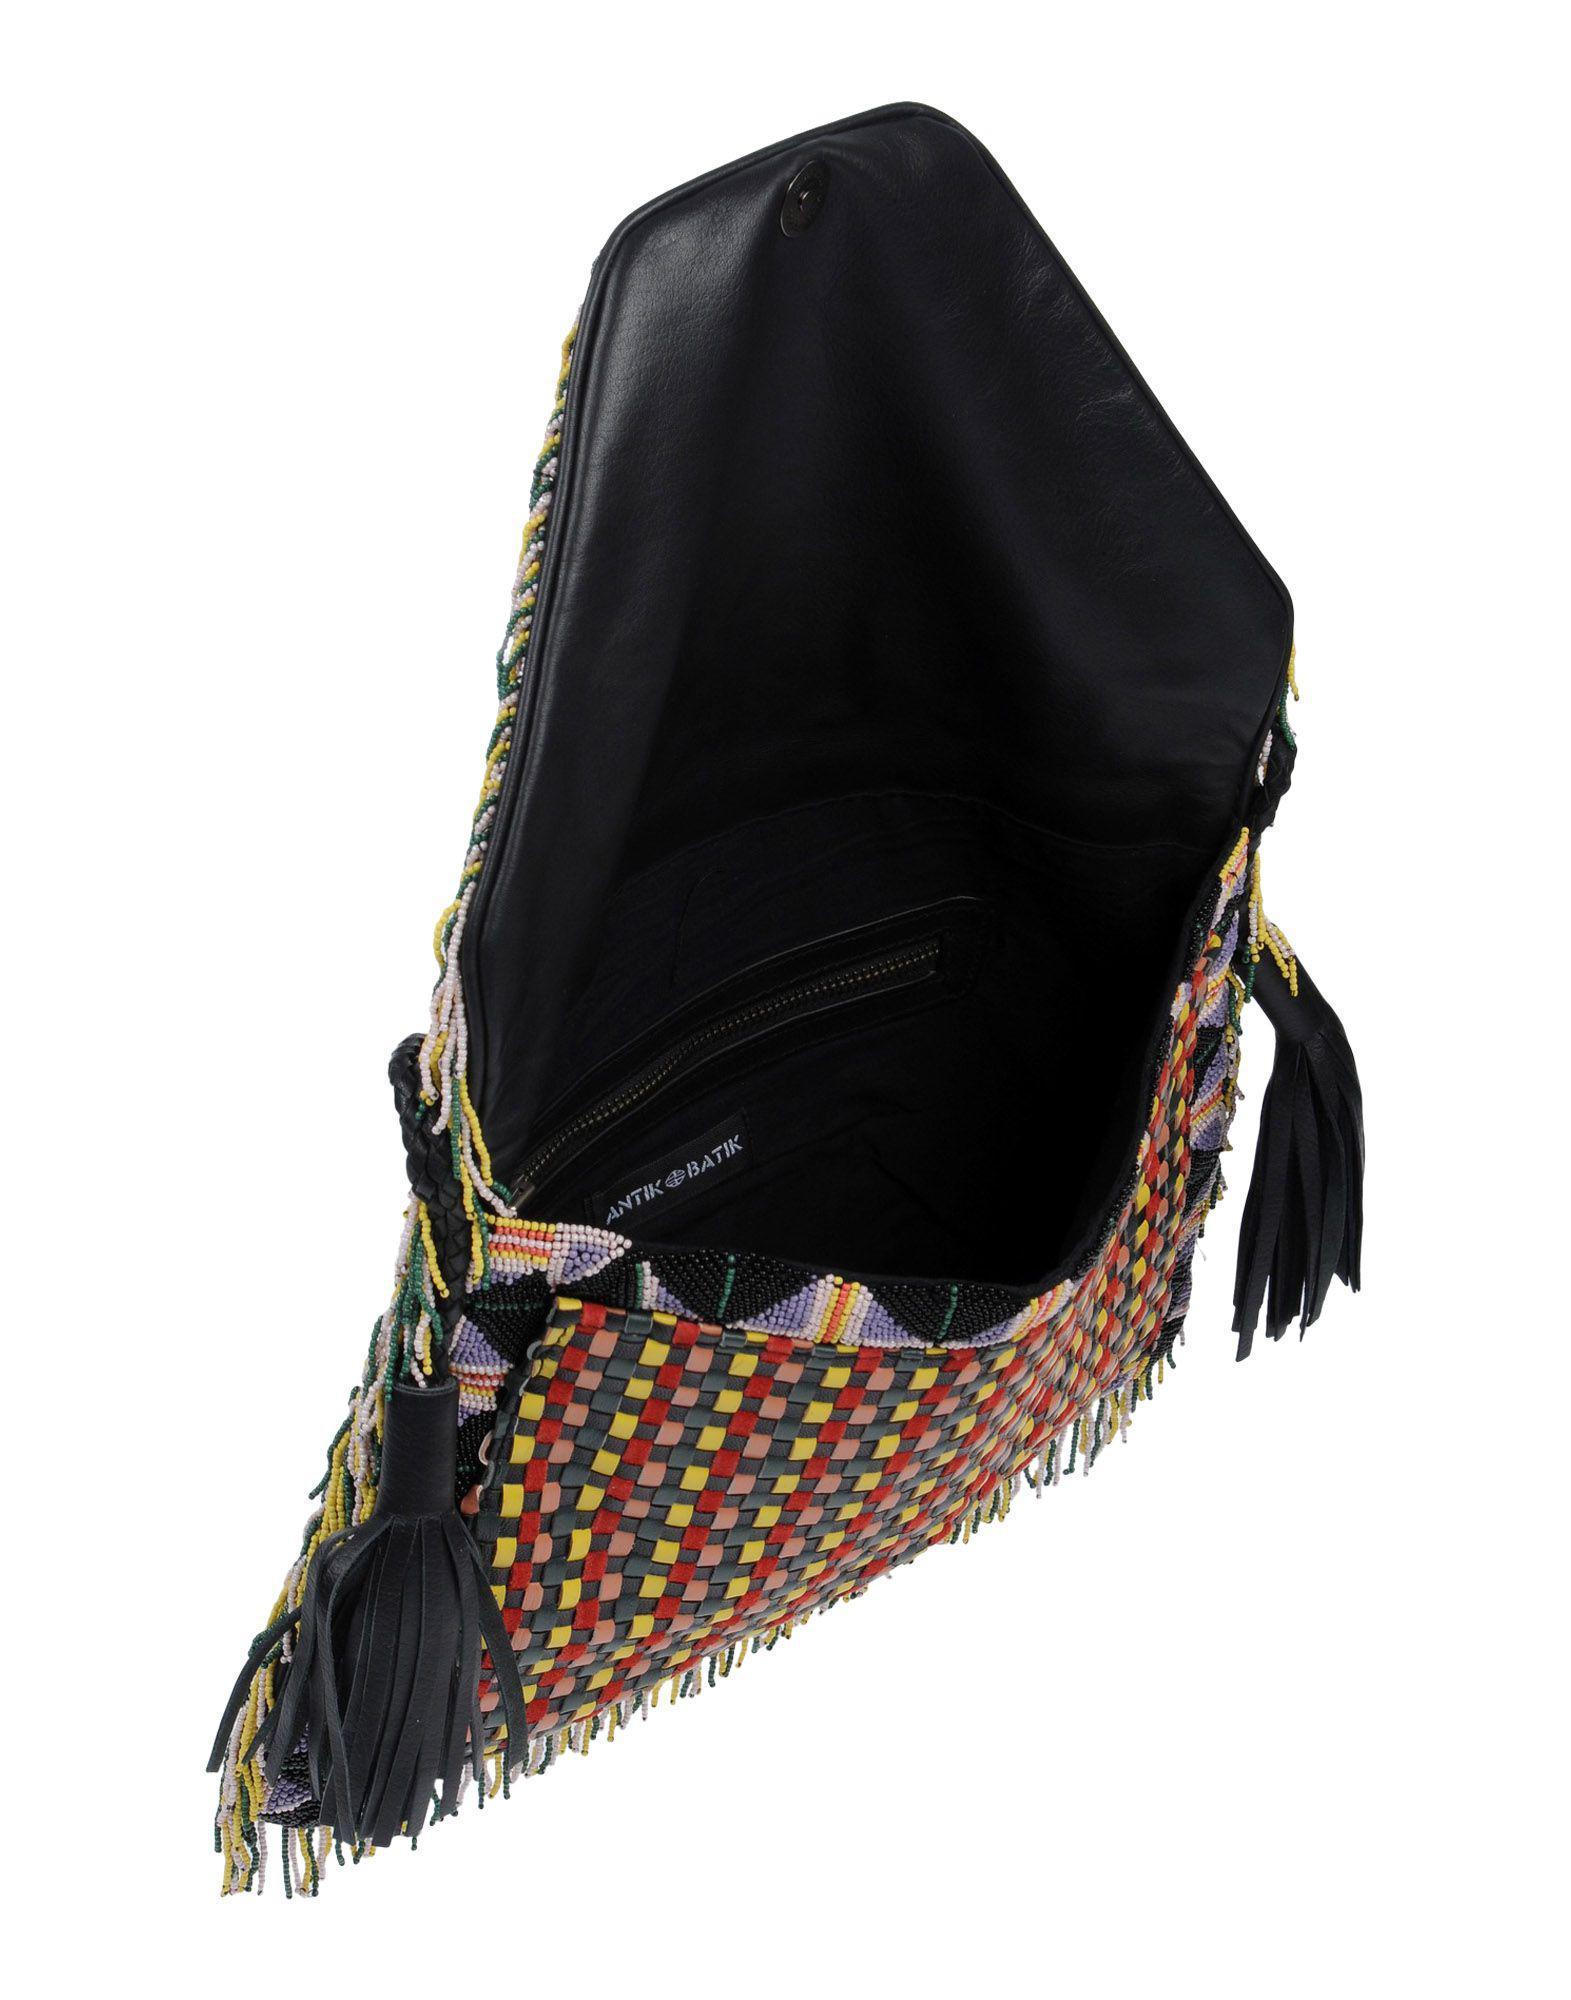 Antik Batik Leather Cross-body Bag in Black